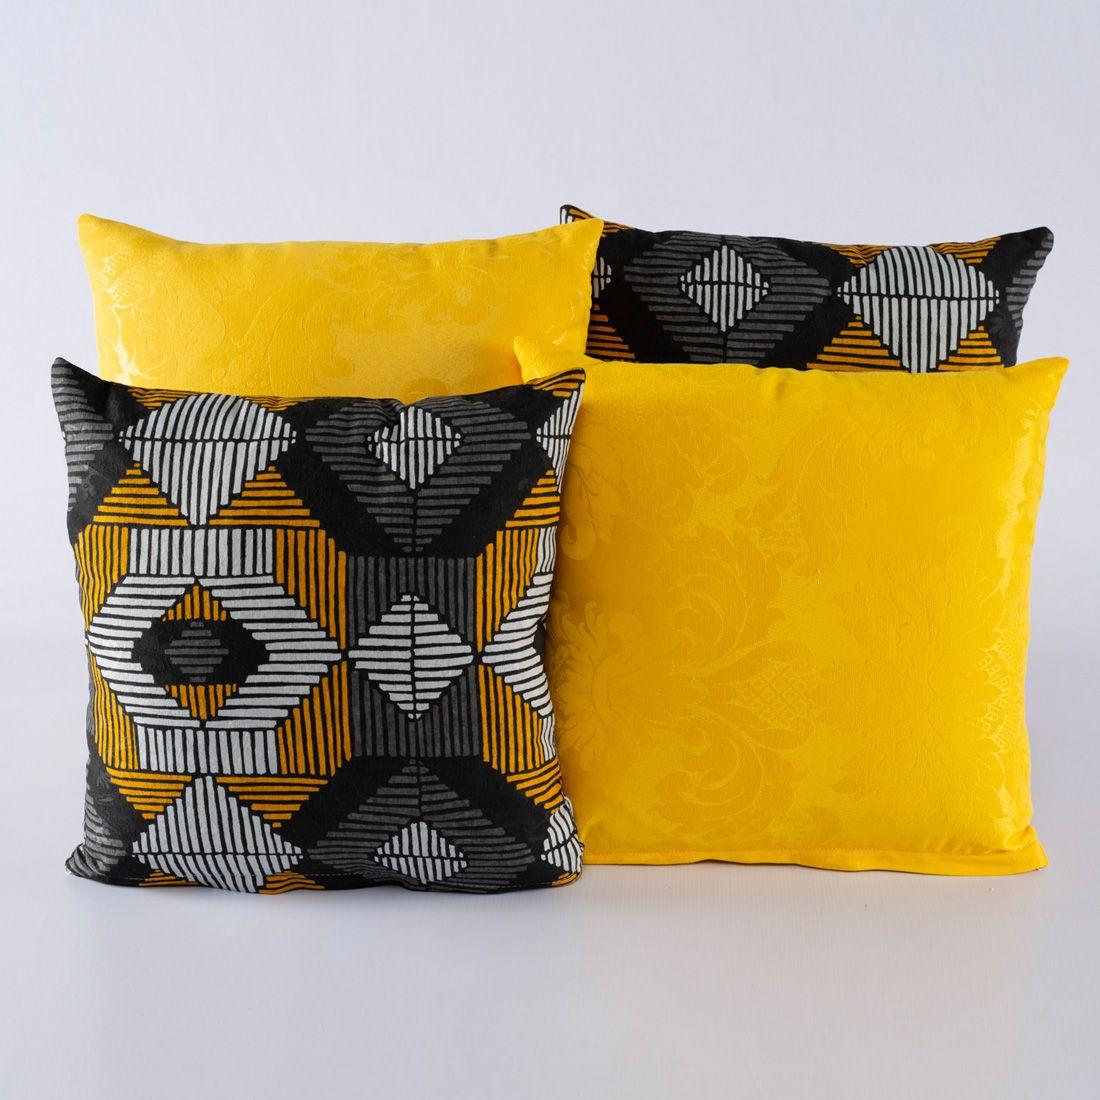 Kit c/ 4 Almofadas Cheias Decorativas Geo Amarelo/Cinza